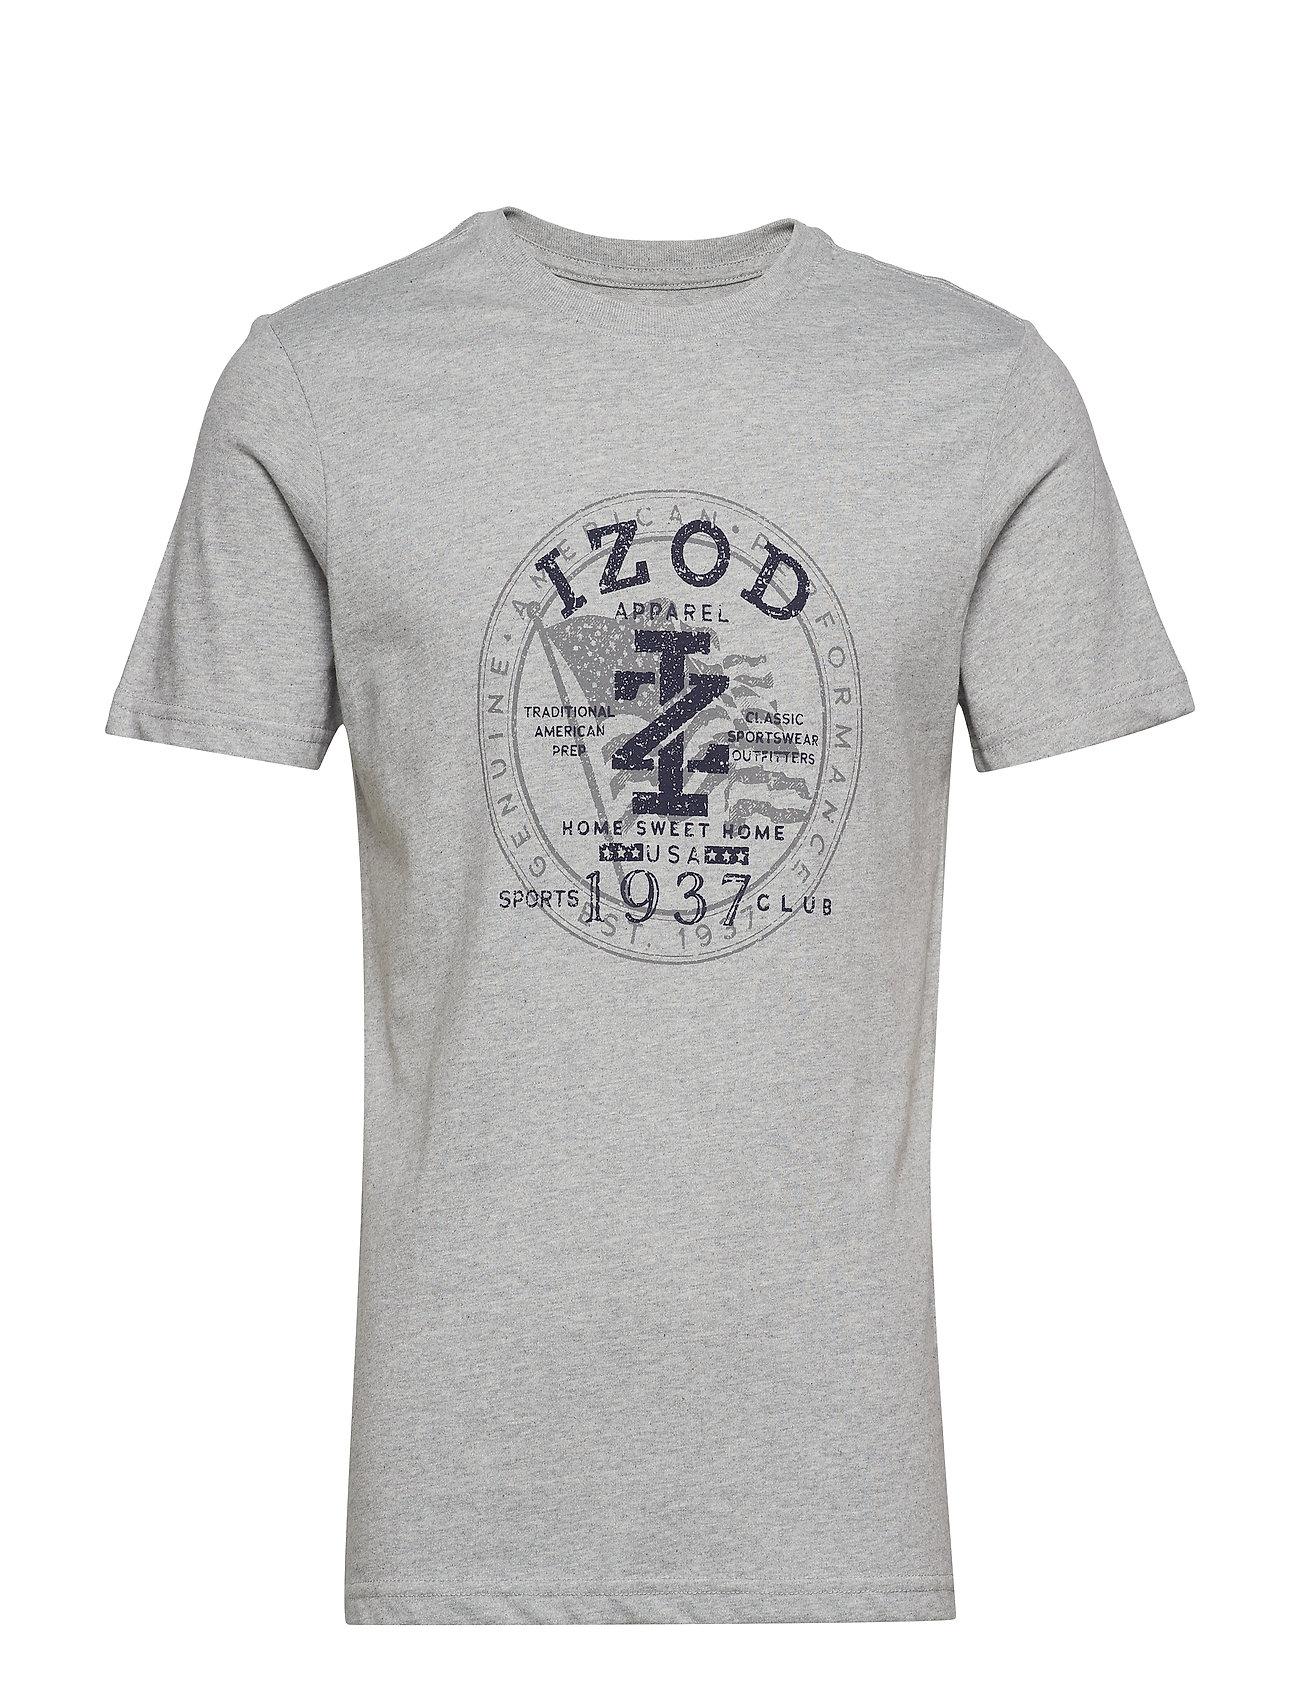 HtrIzod Crest Americana Graphic Grey Teelt KTF1clJ